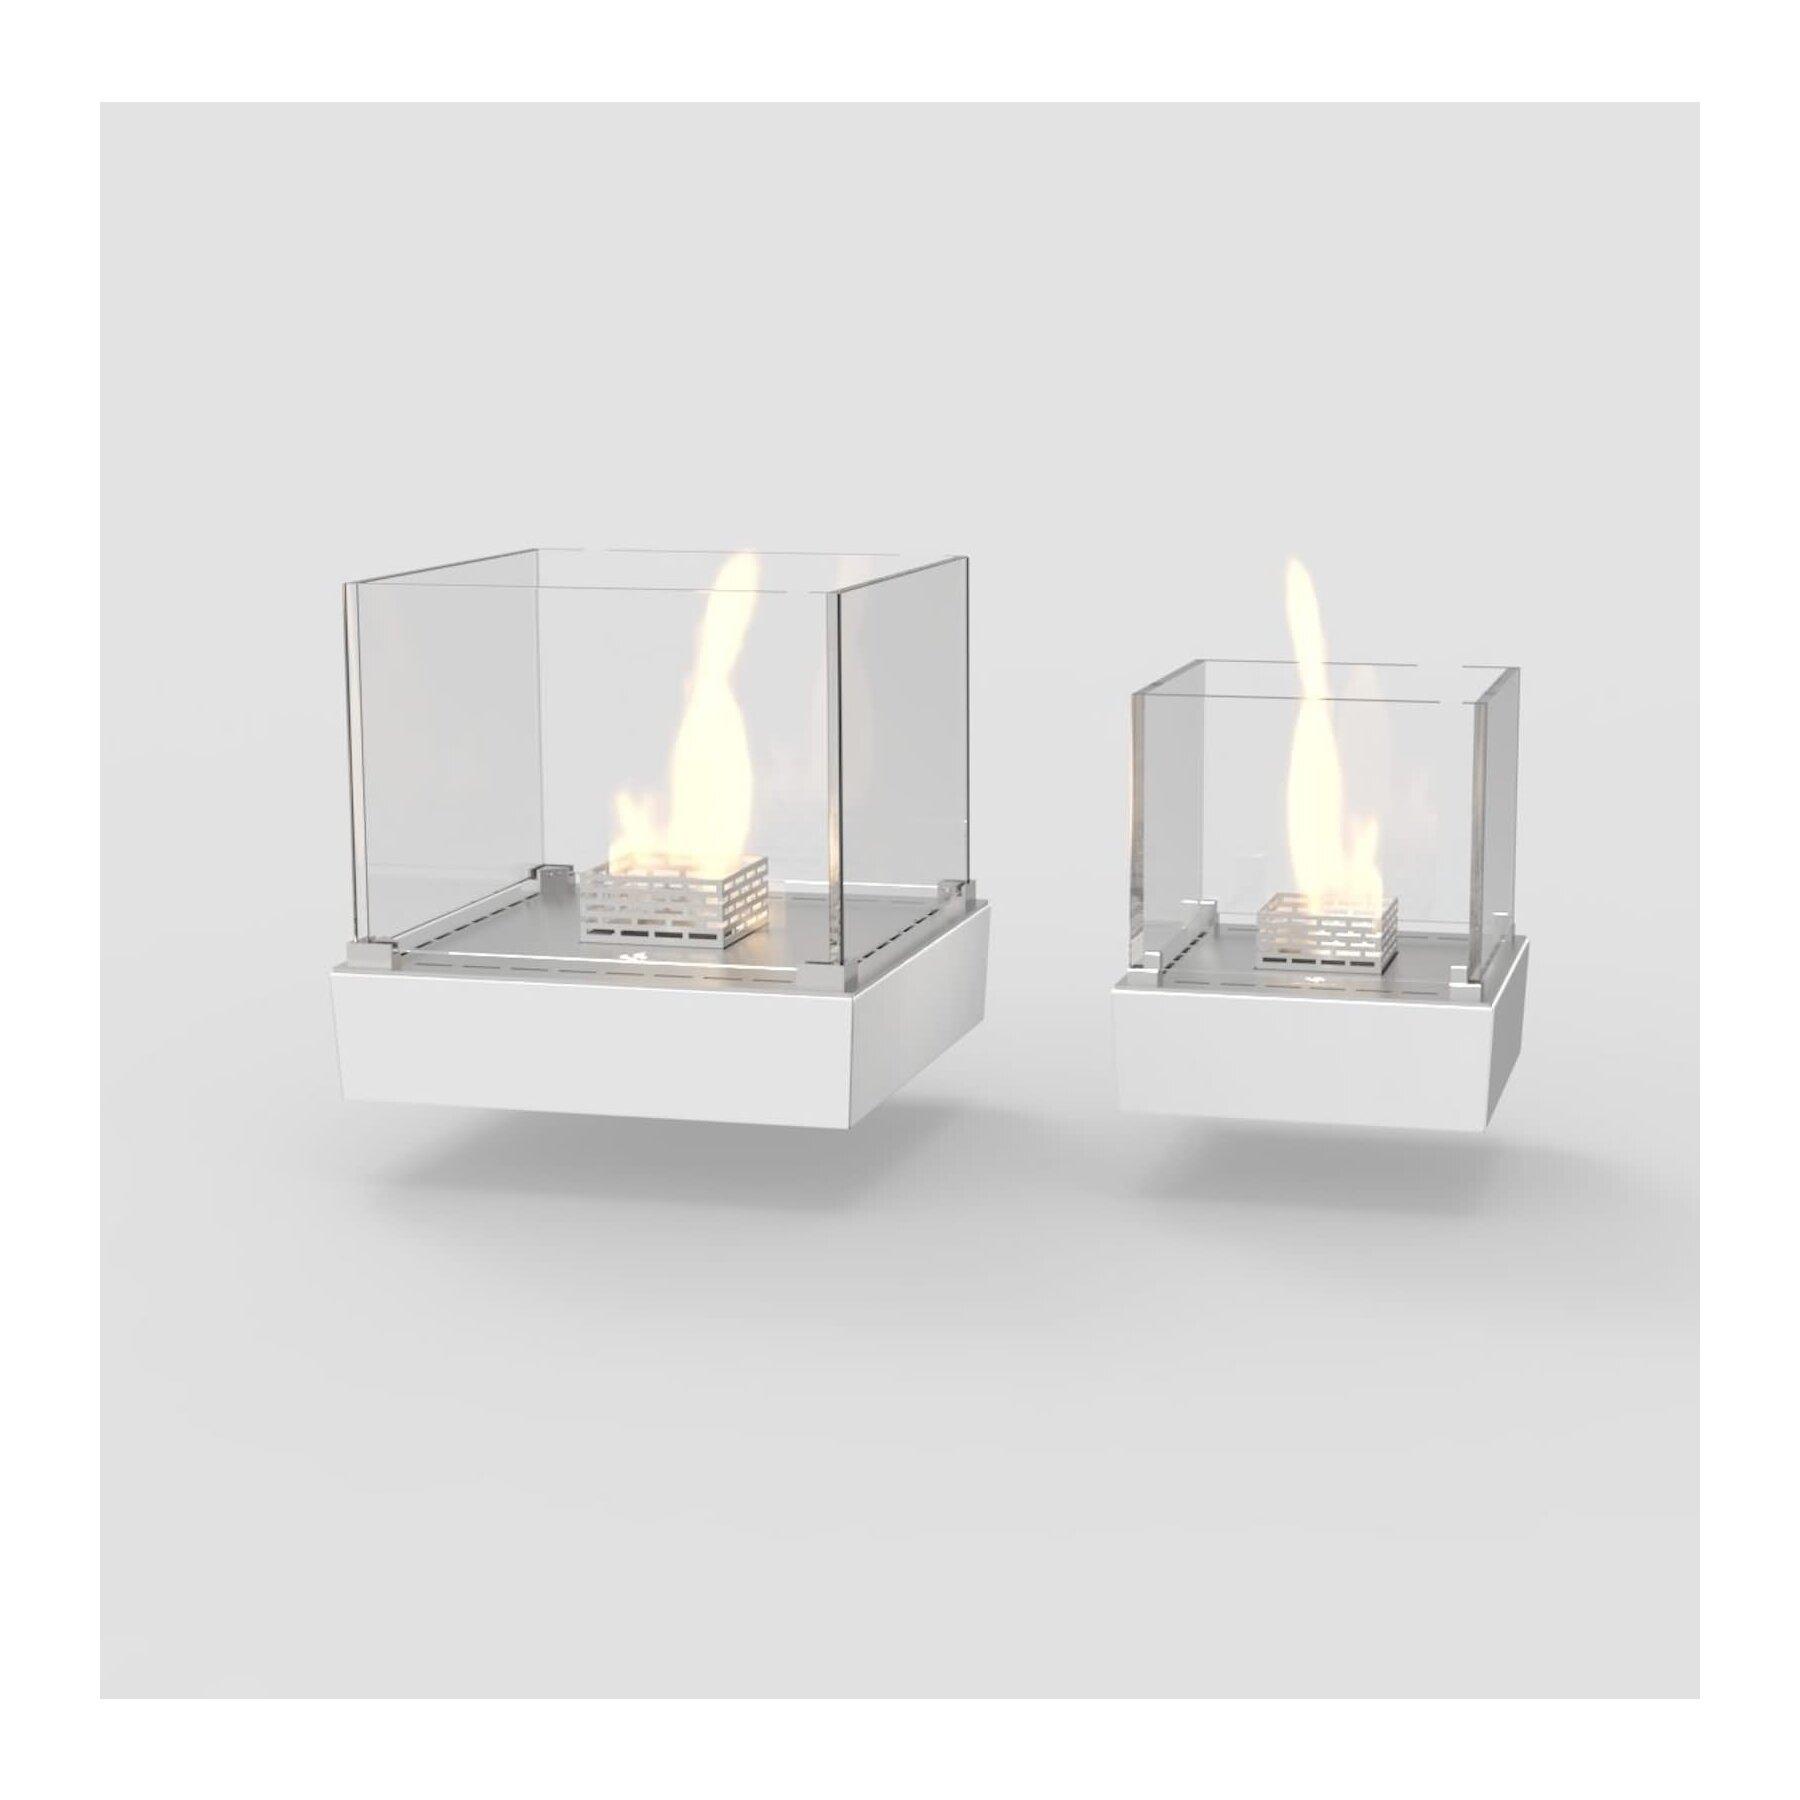 Tisch ethanol kamin decoflame nicetable top for Design tisch kamin